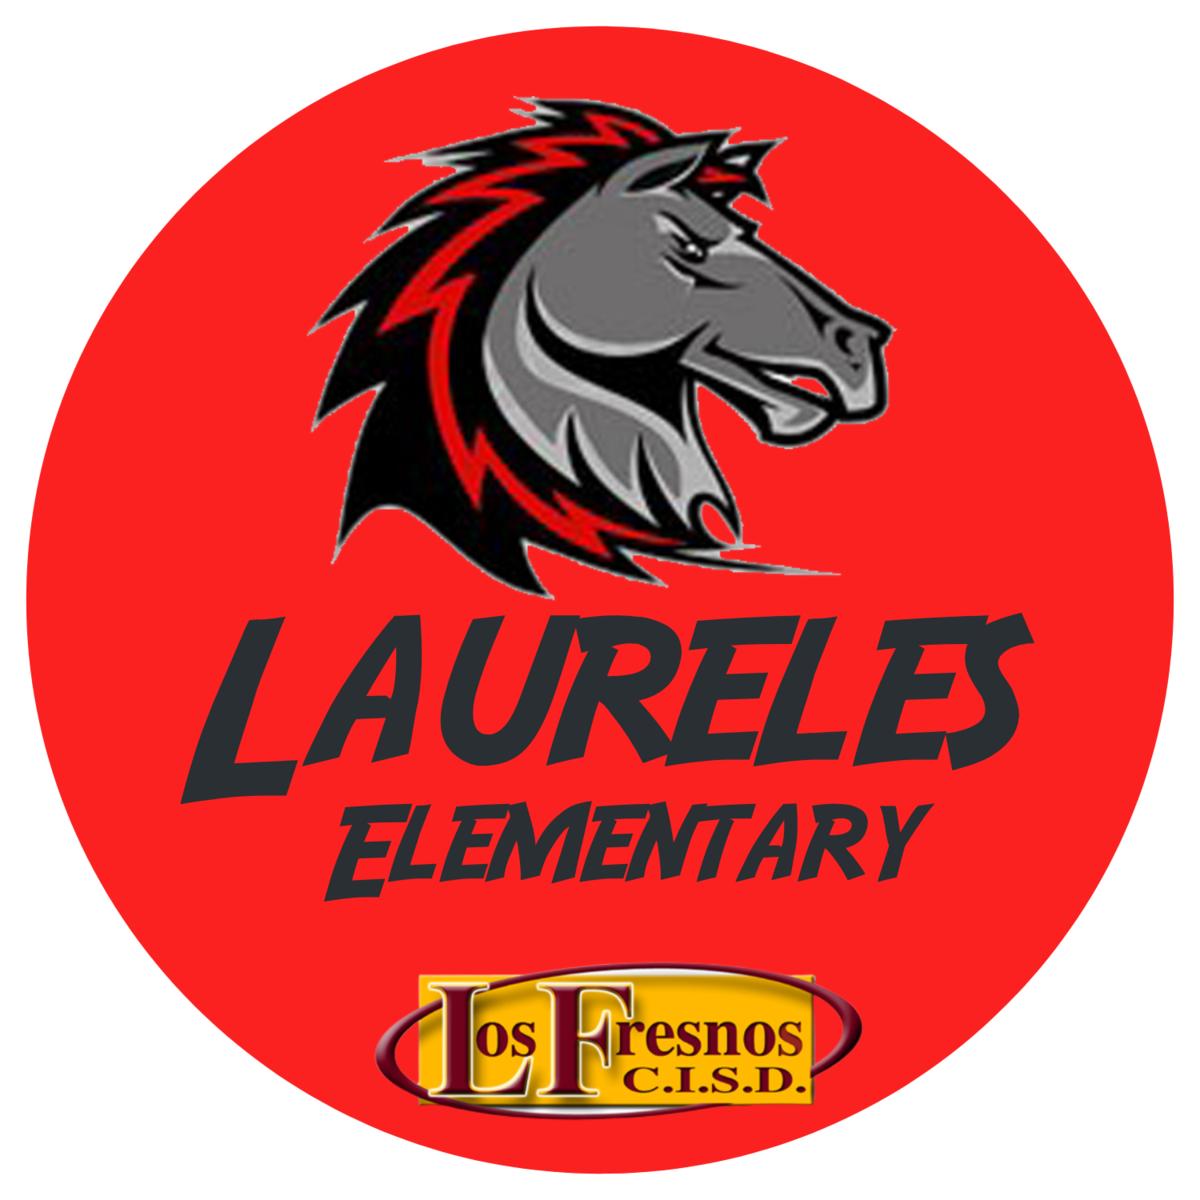 Laureles Elementary School logo